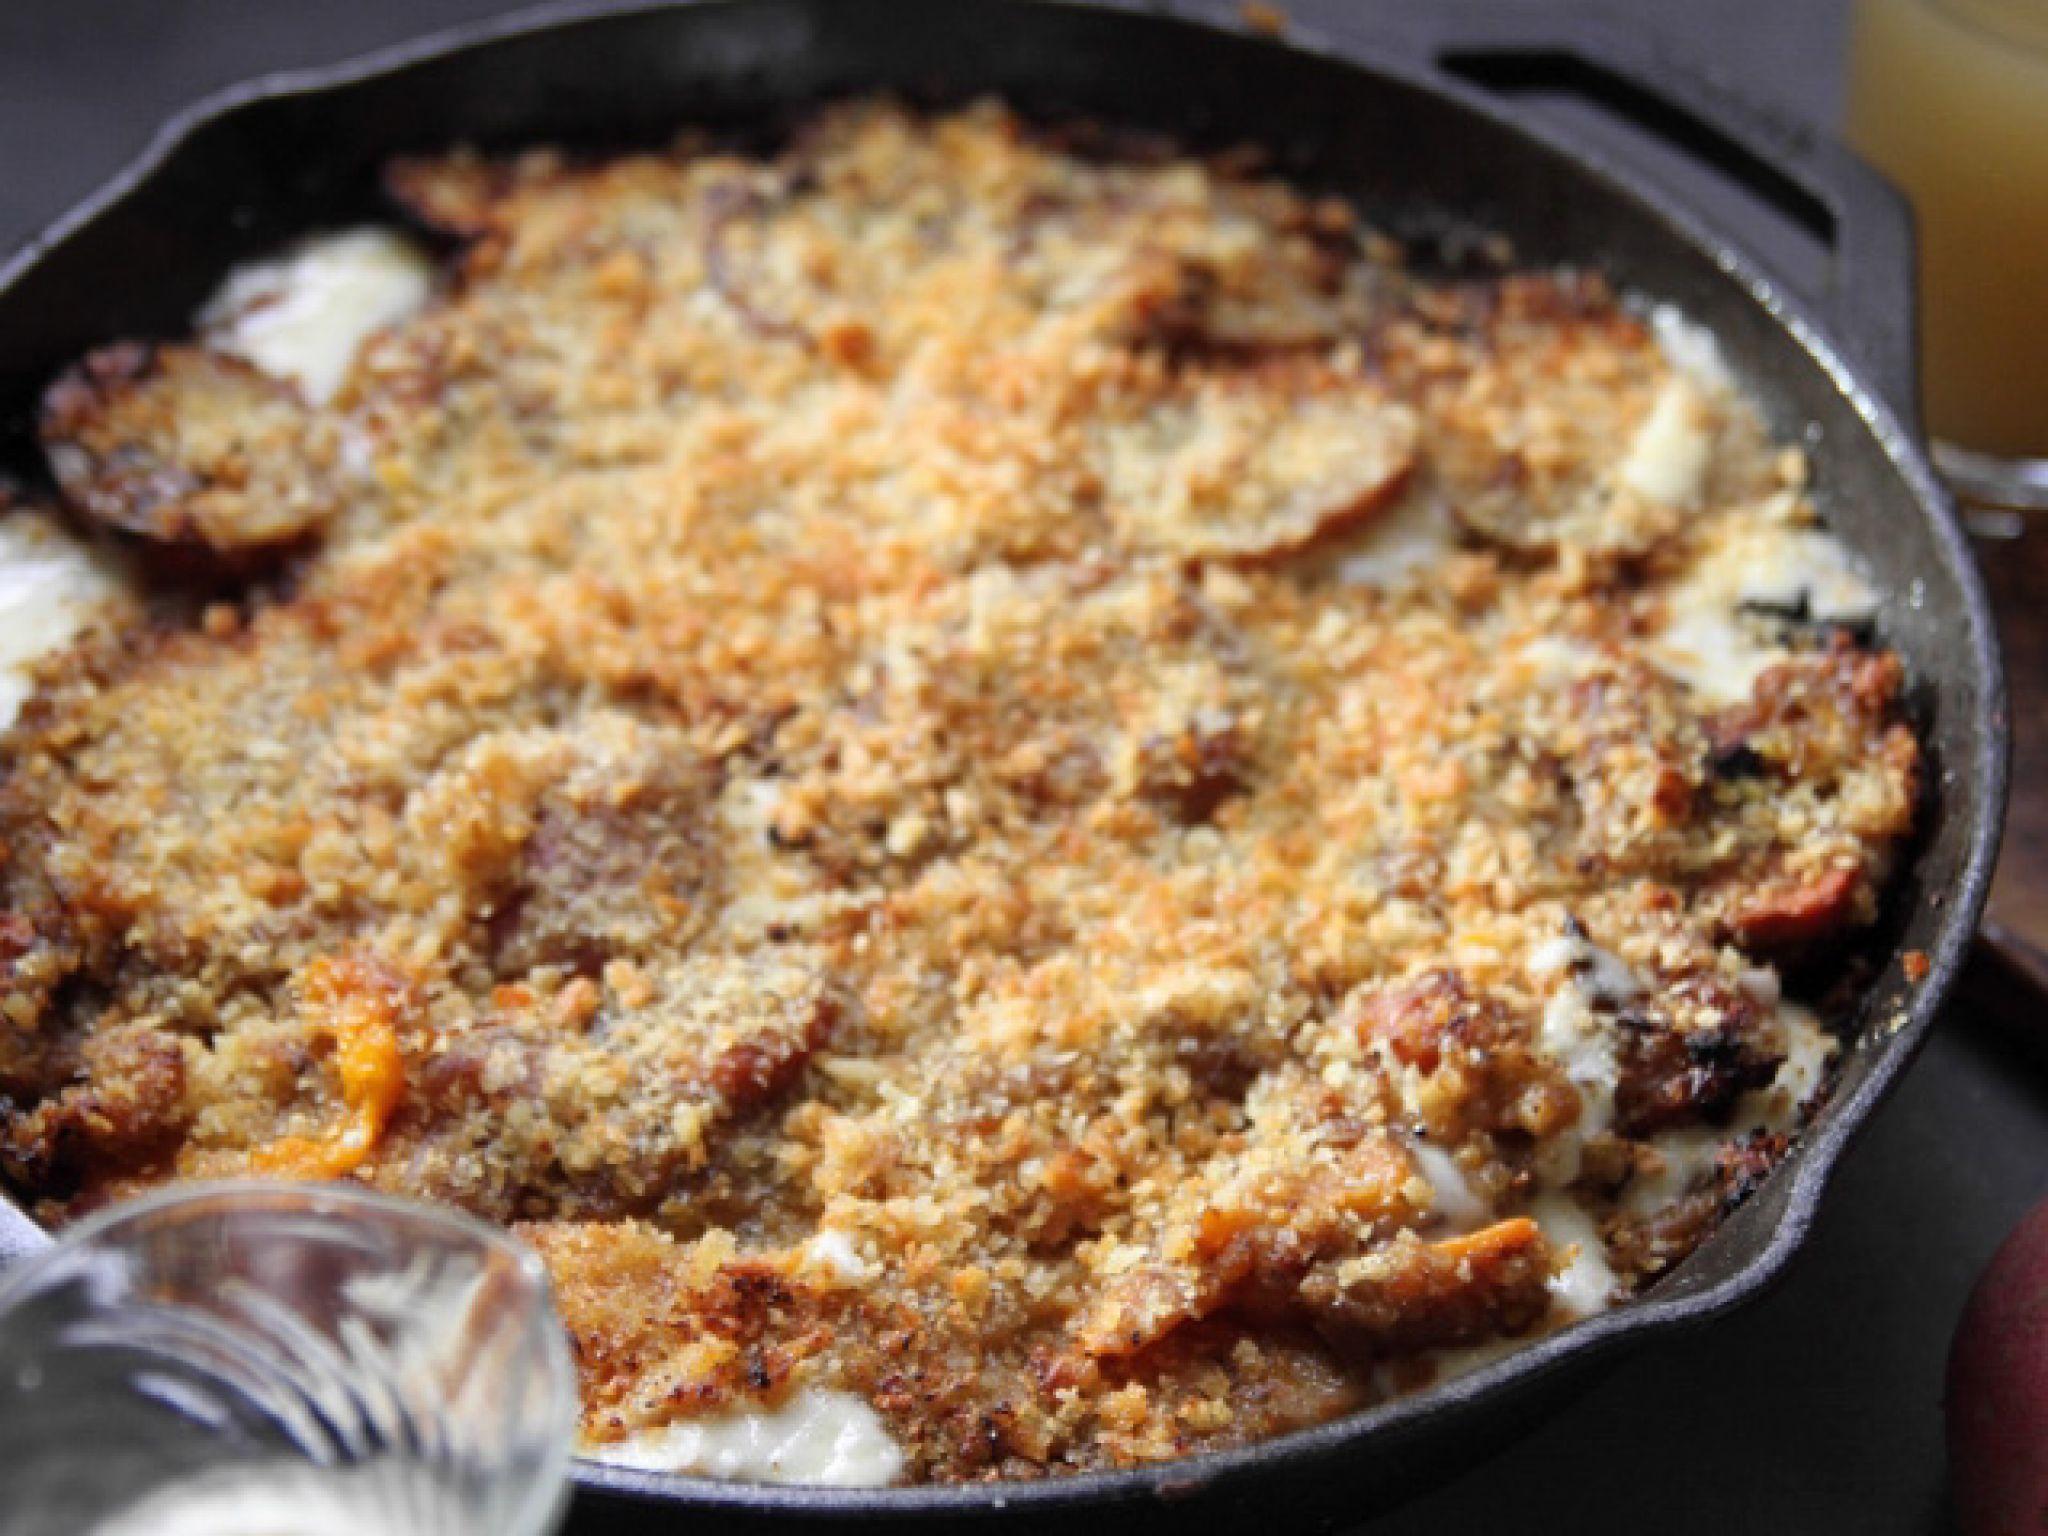 Scalloped Vegetable Casserole #farmhouserulesrecipes